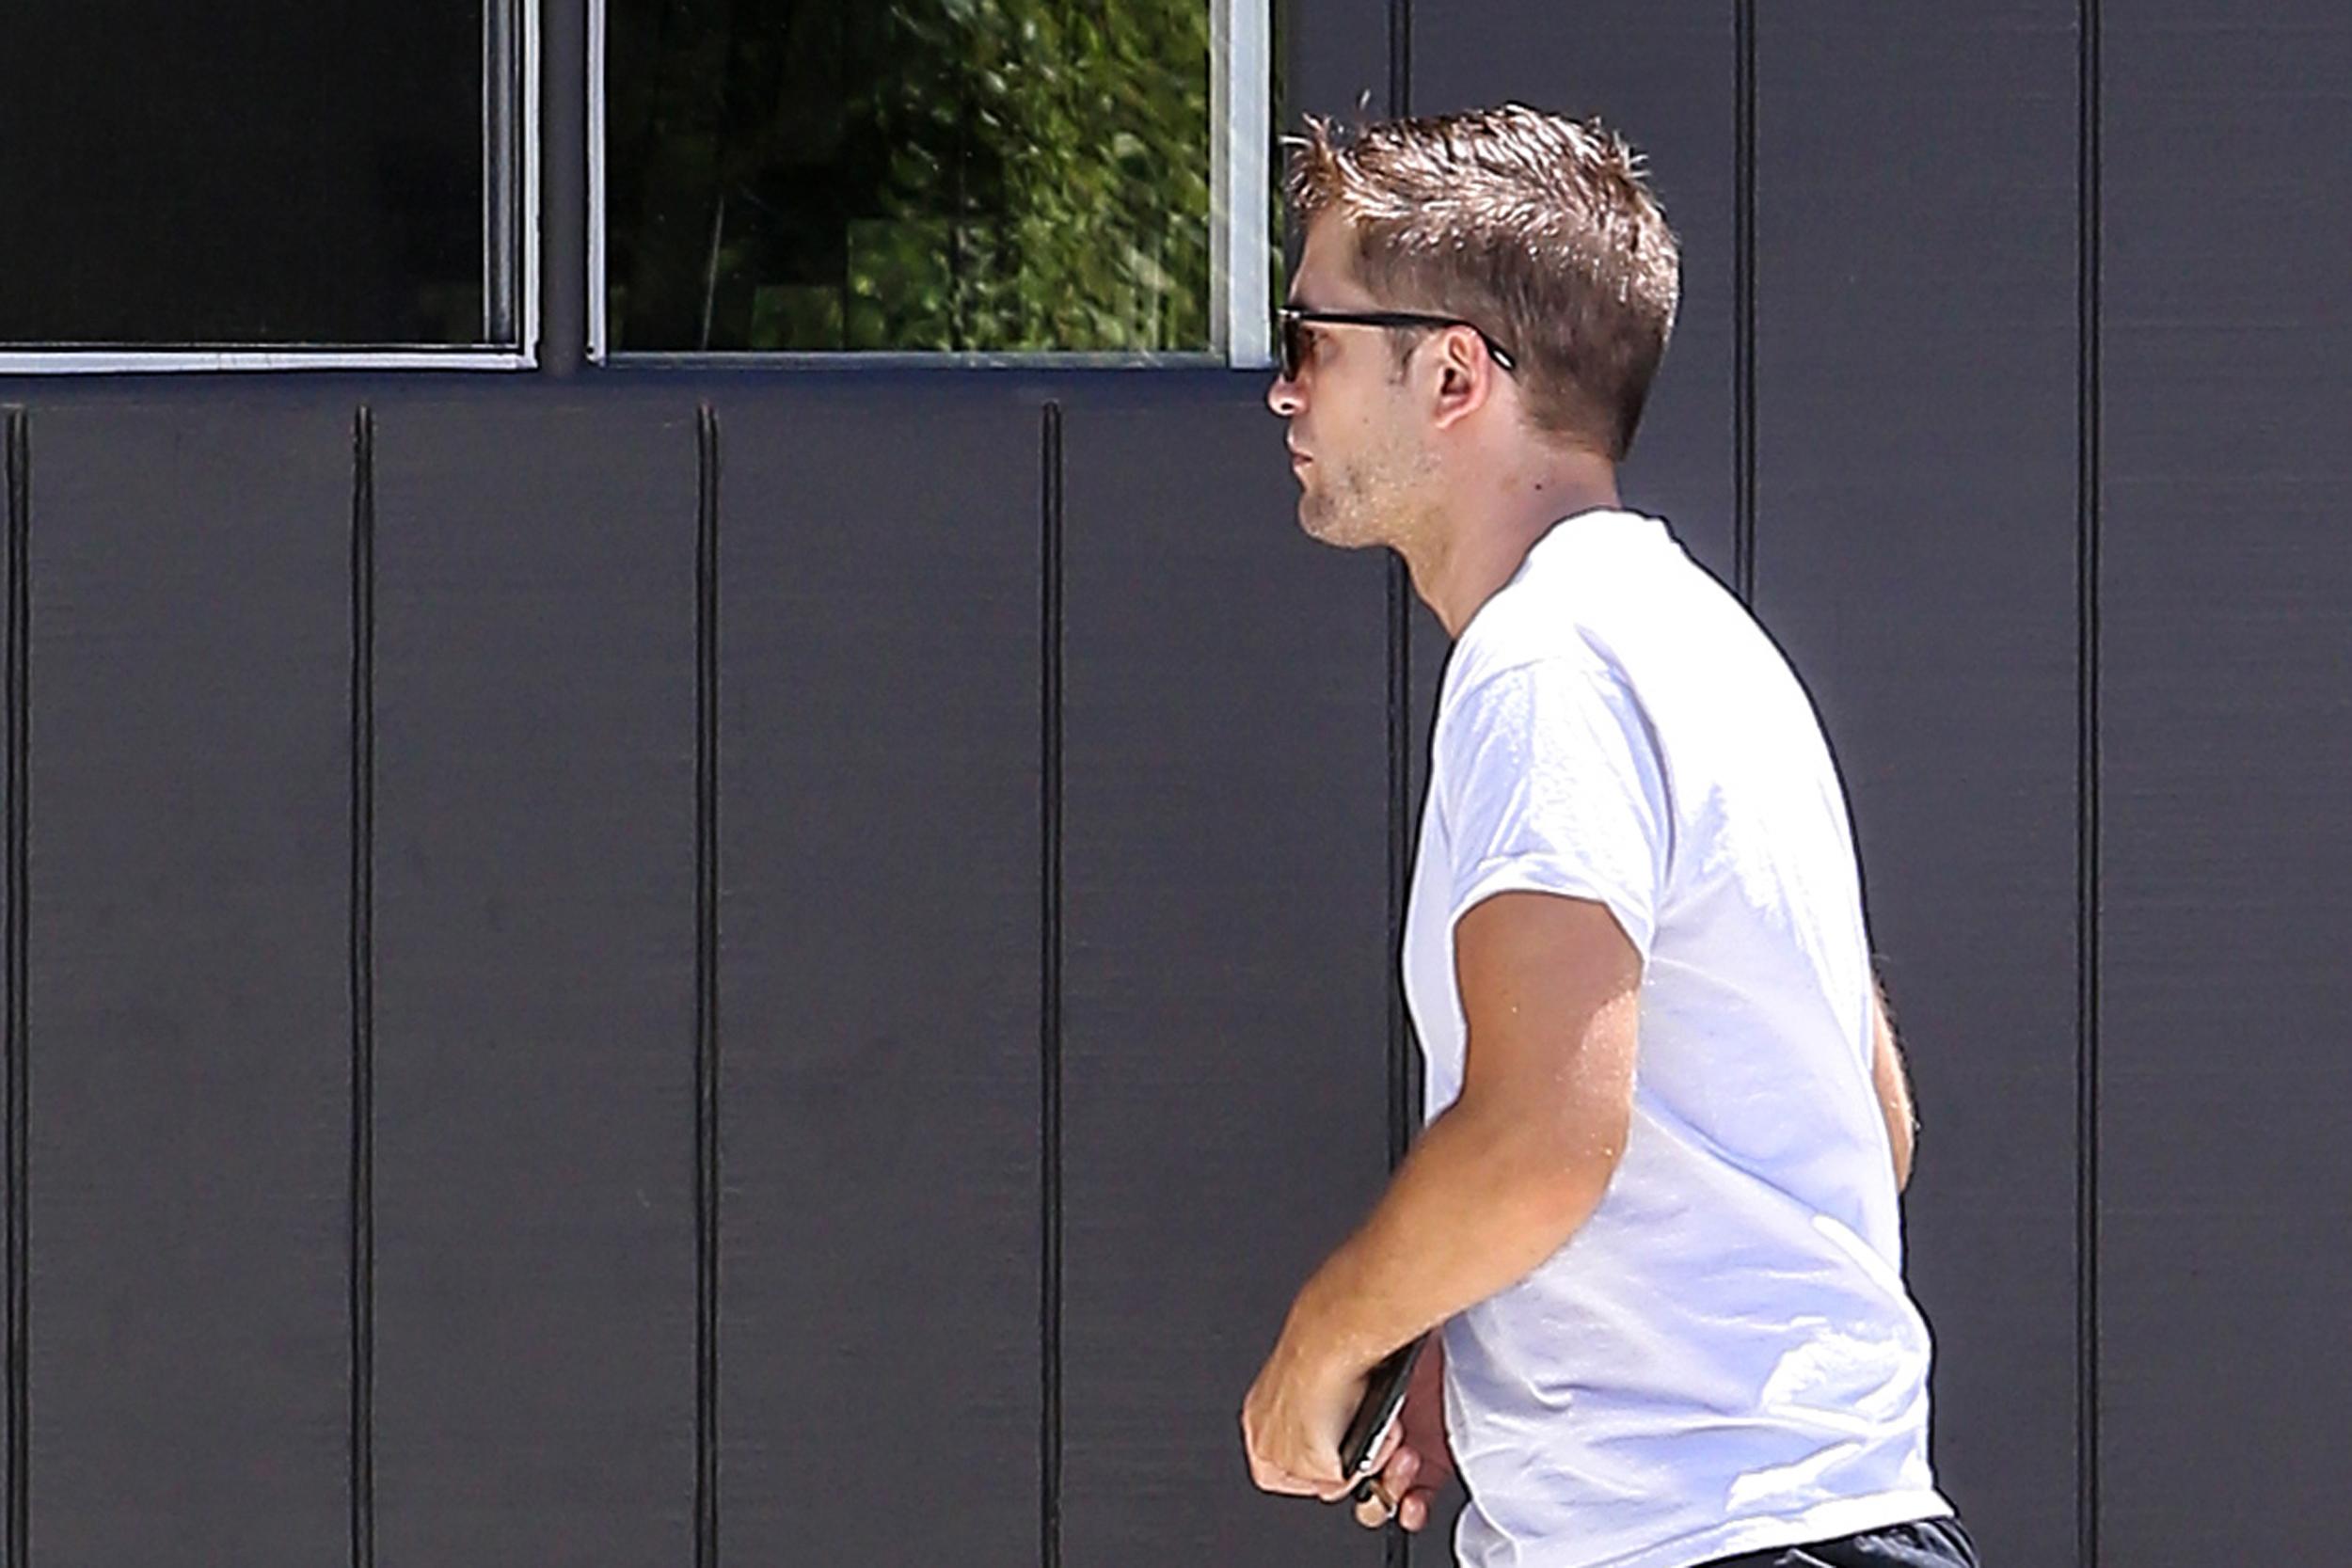 Fotos de Robert Pattinson em Los Angeles na semana passada